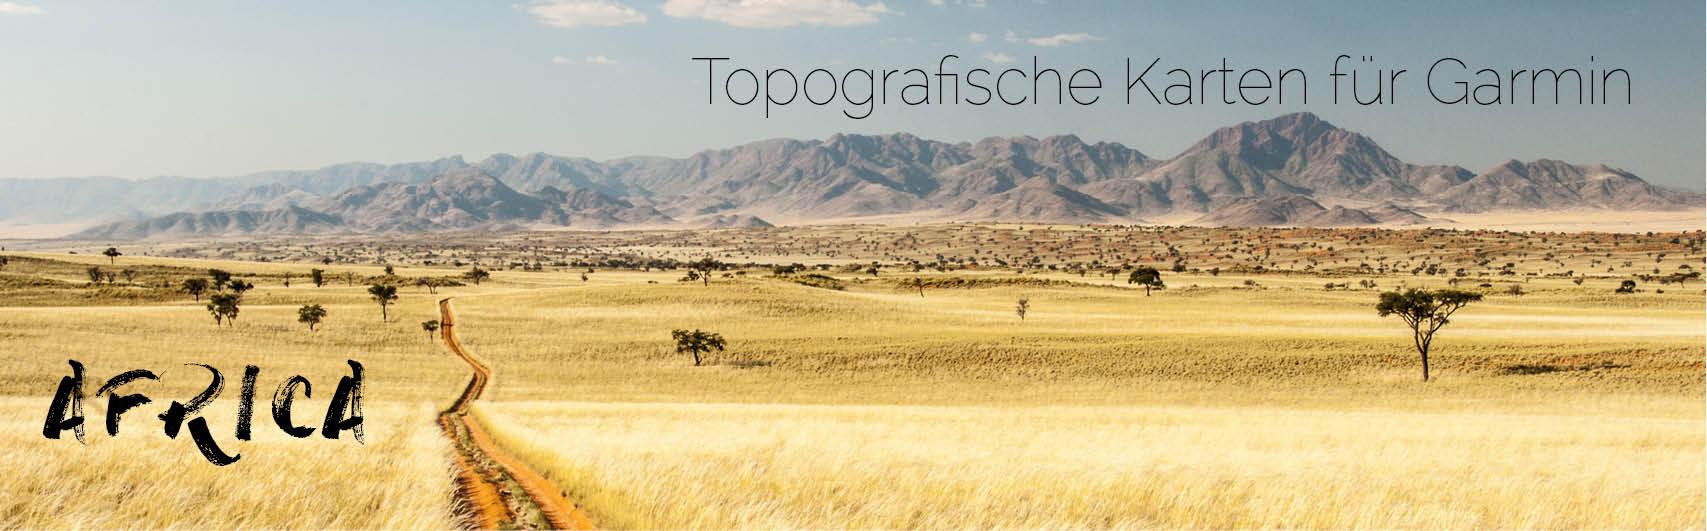 topo-karten-garmin-africa-navitracks